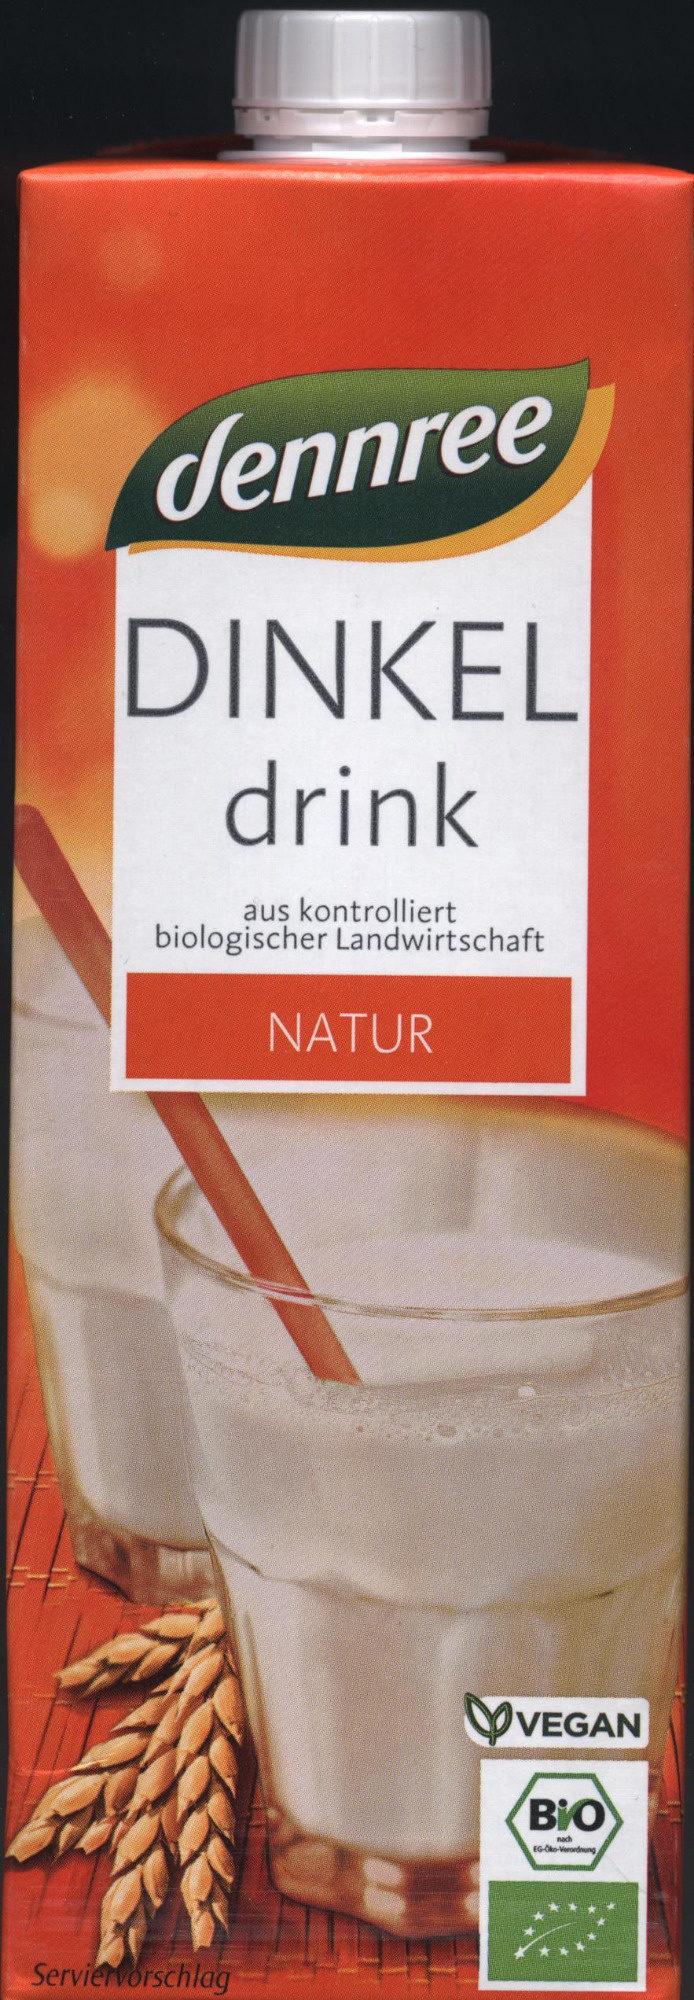 Dinkel drink - Natur - Produit - de